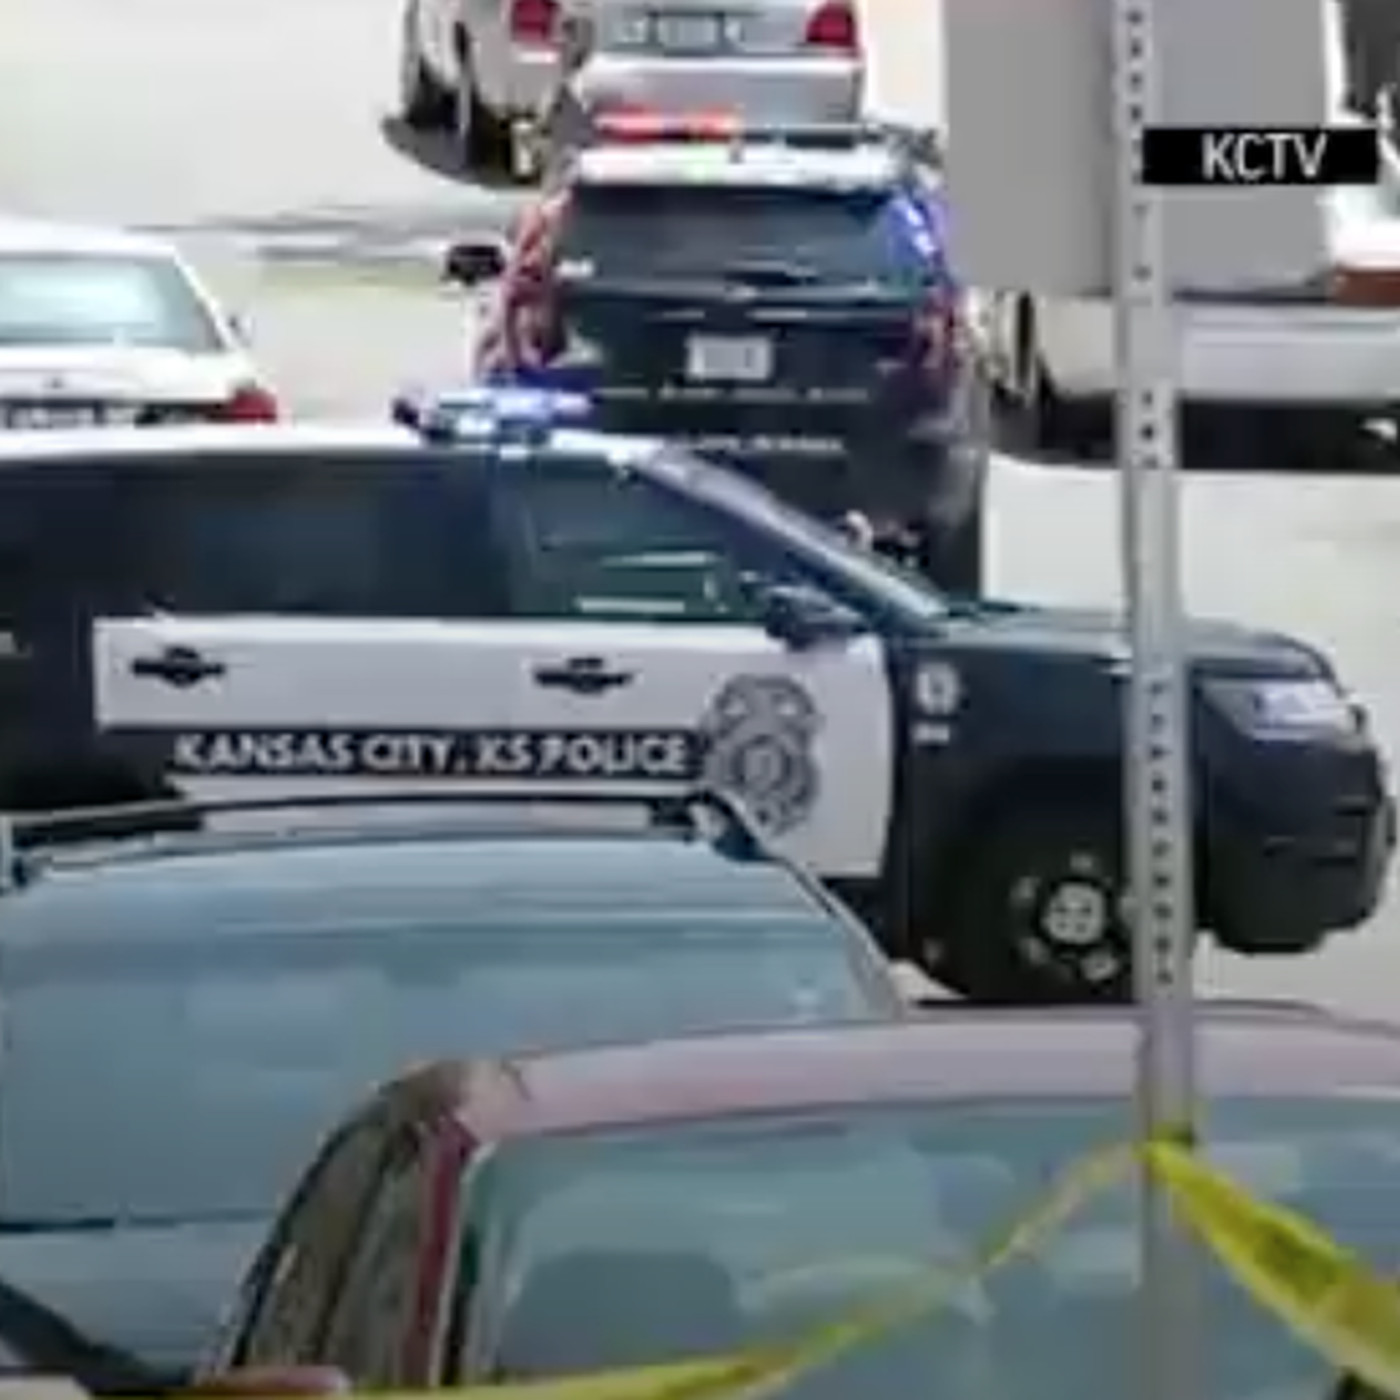 Kansas City courthouse shooting: 1 sheriff's deputy killed, another